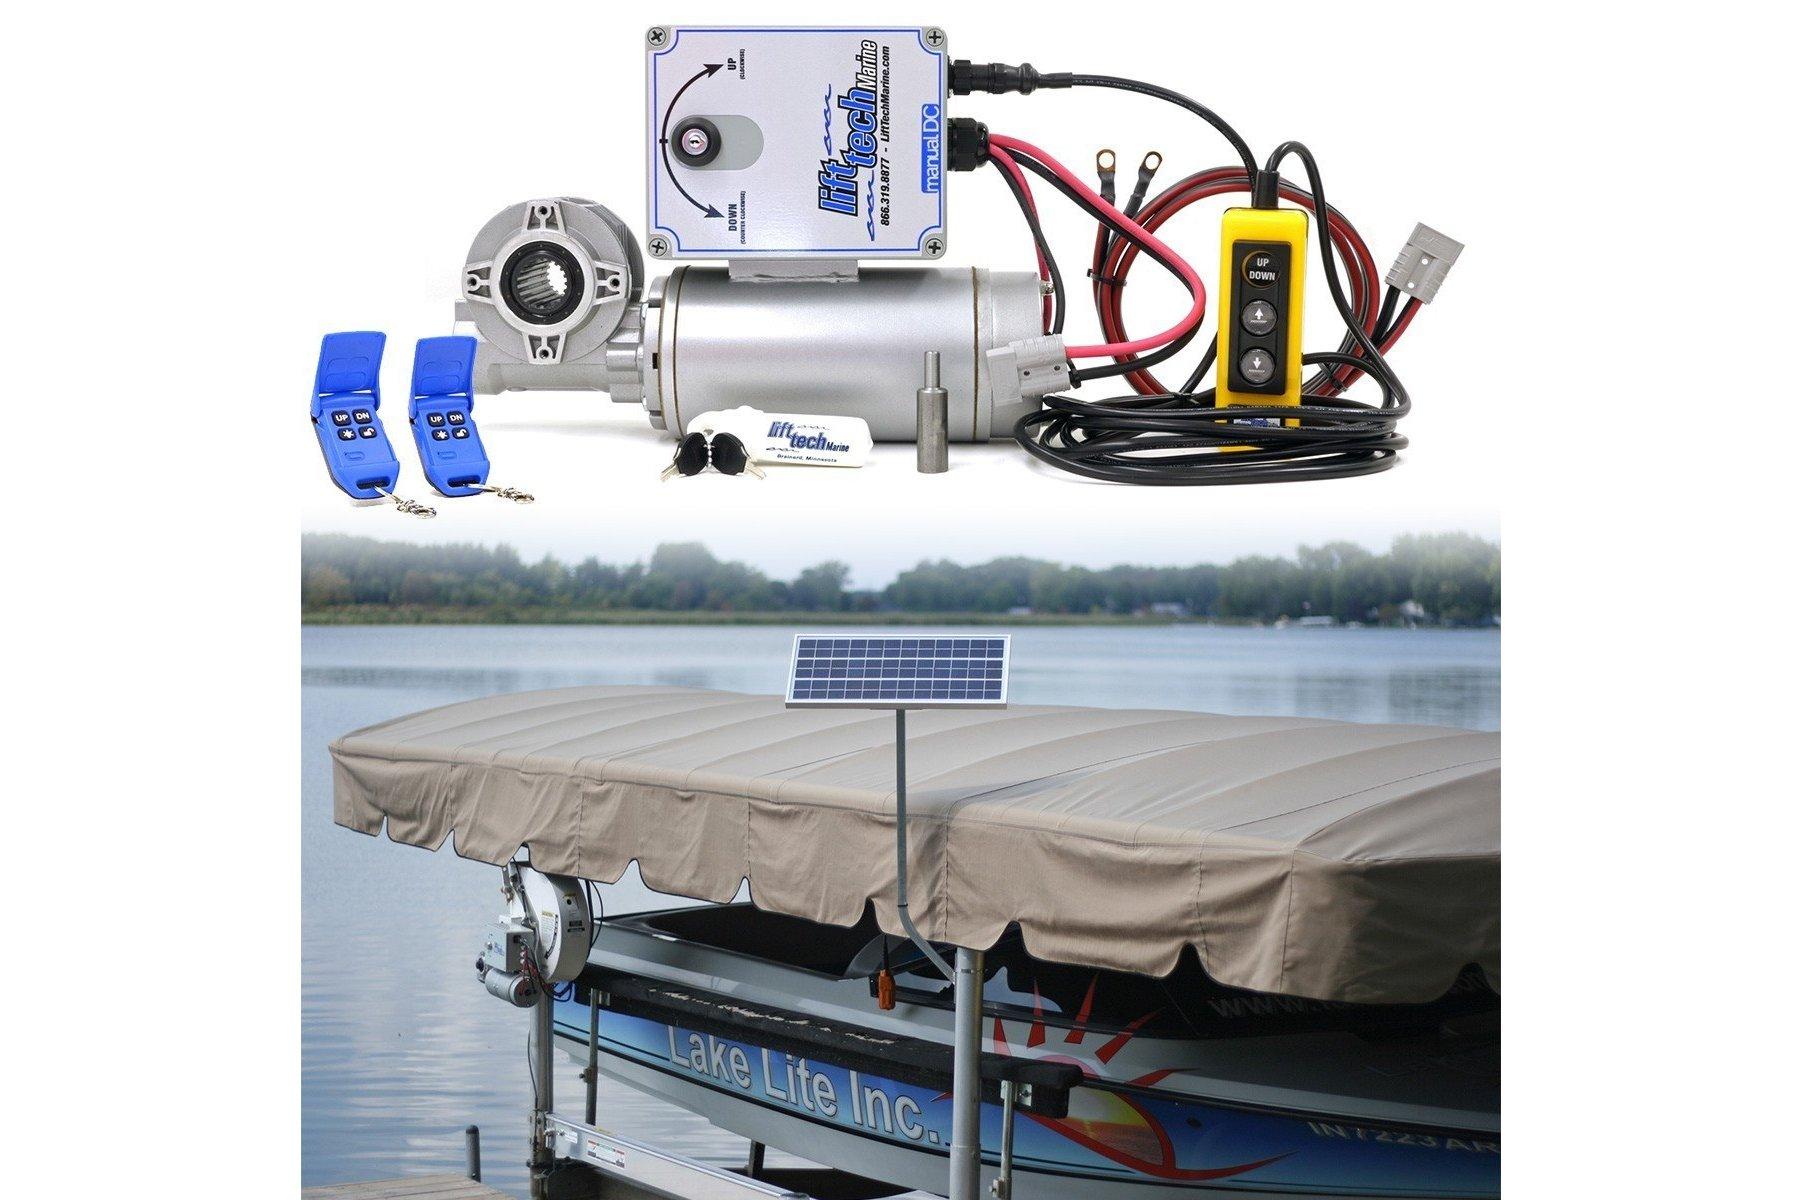 12v Direct Drive Boat Lift Motor + 20w-12v Boat Lift Charging Kit